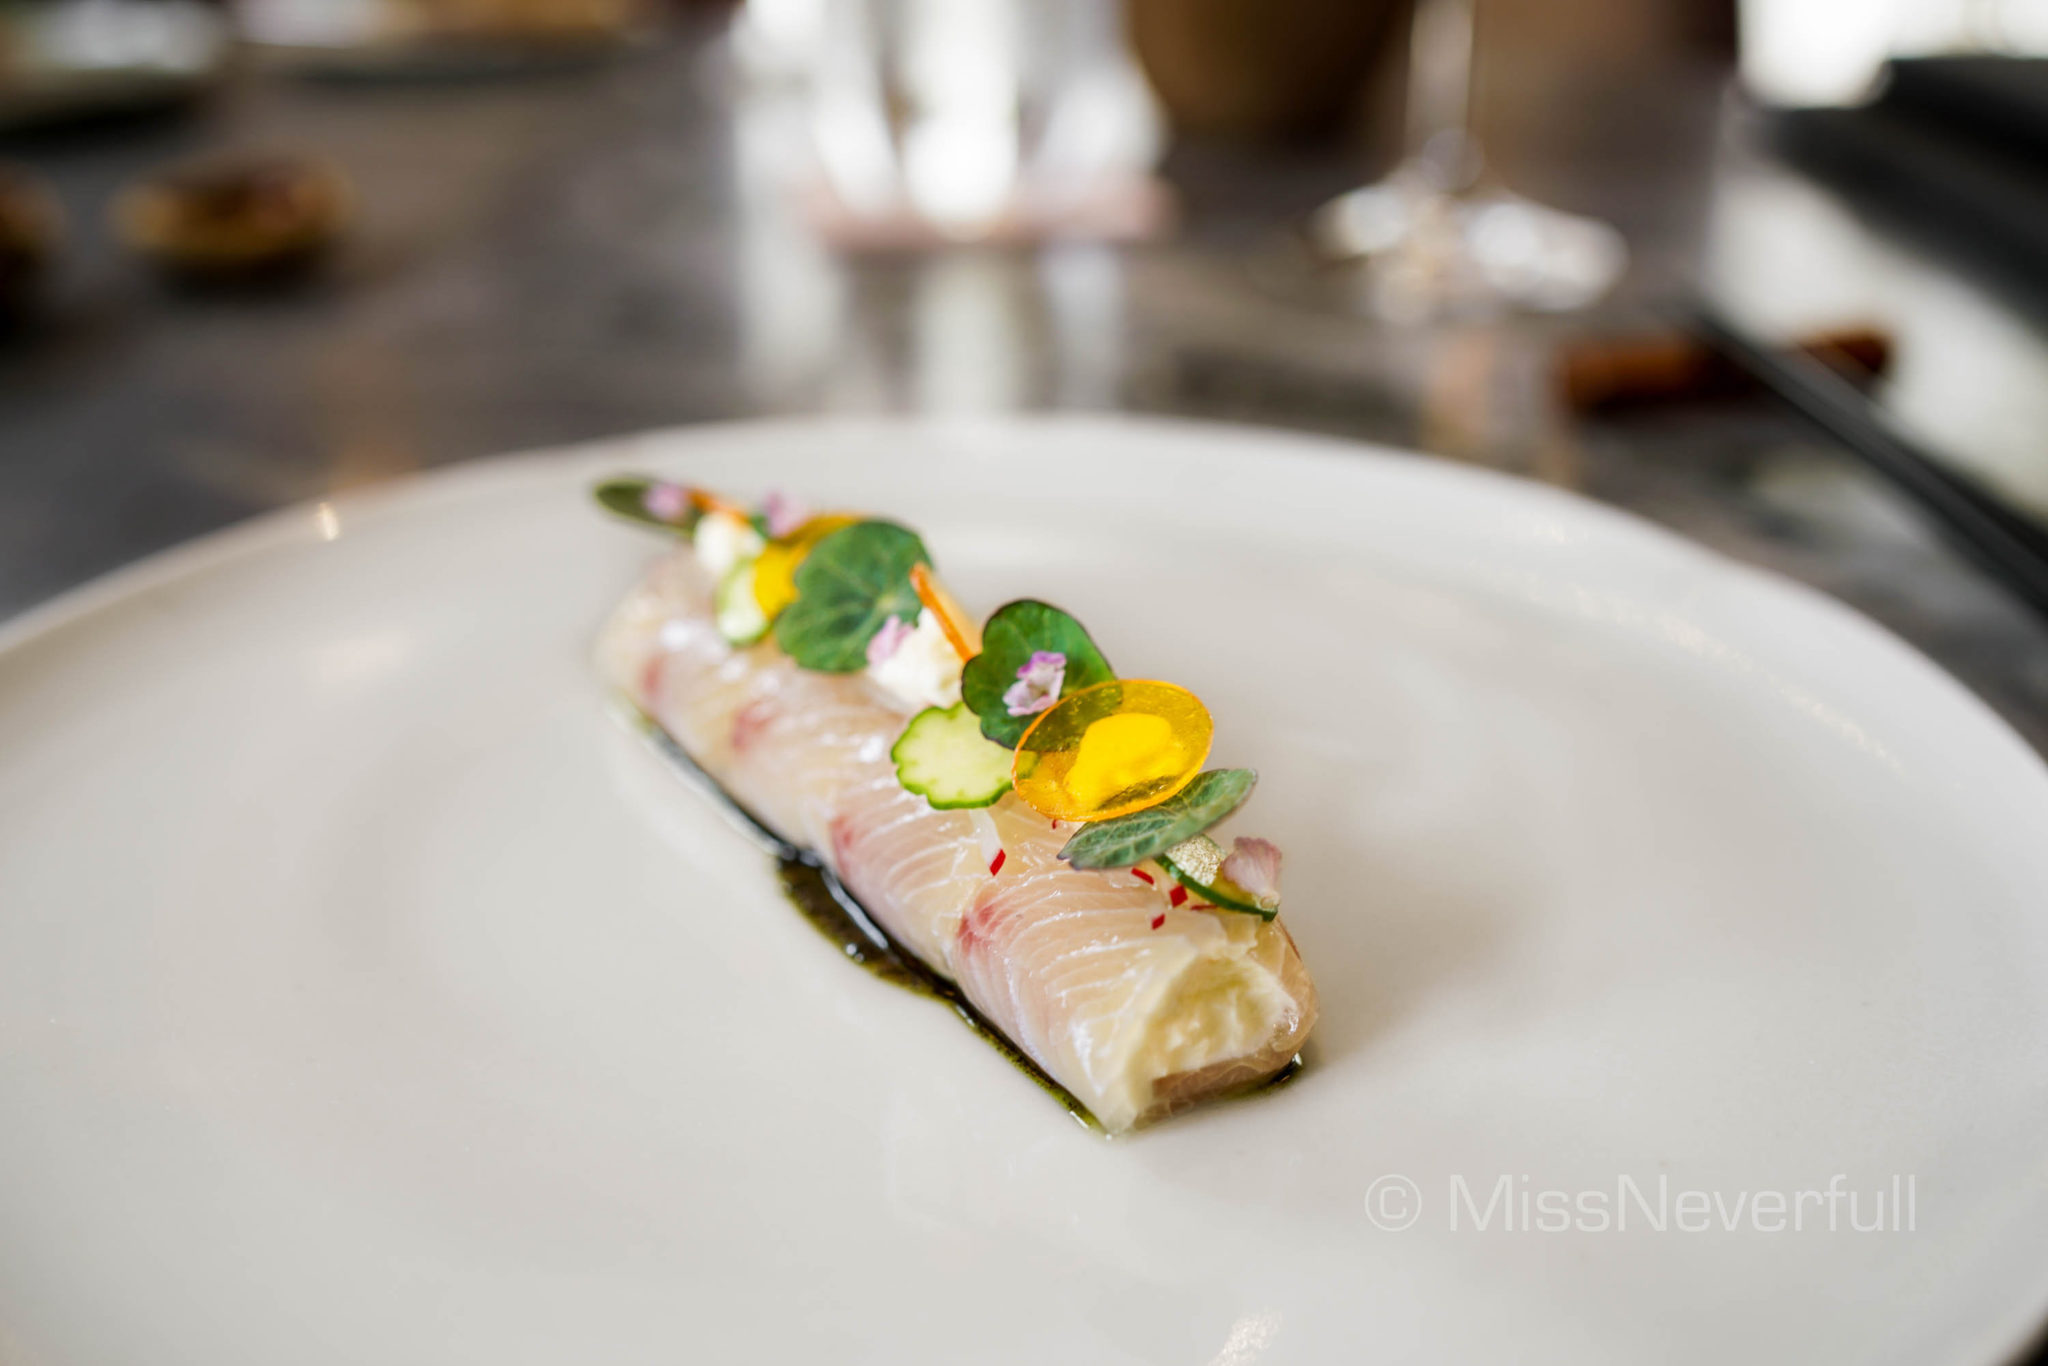 Sashimi of yellowtail Amberjack, lime crème fraîche, dashi jelly, white soy dressing